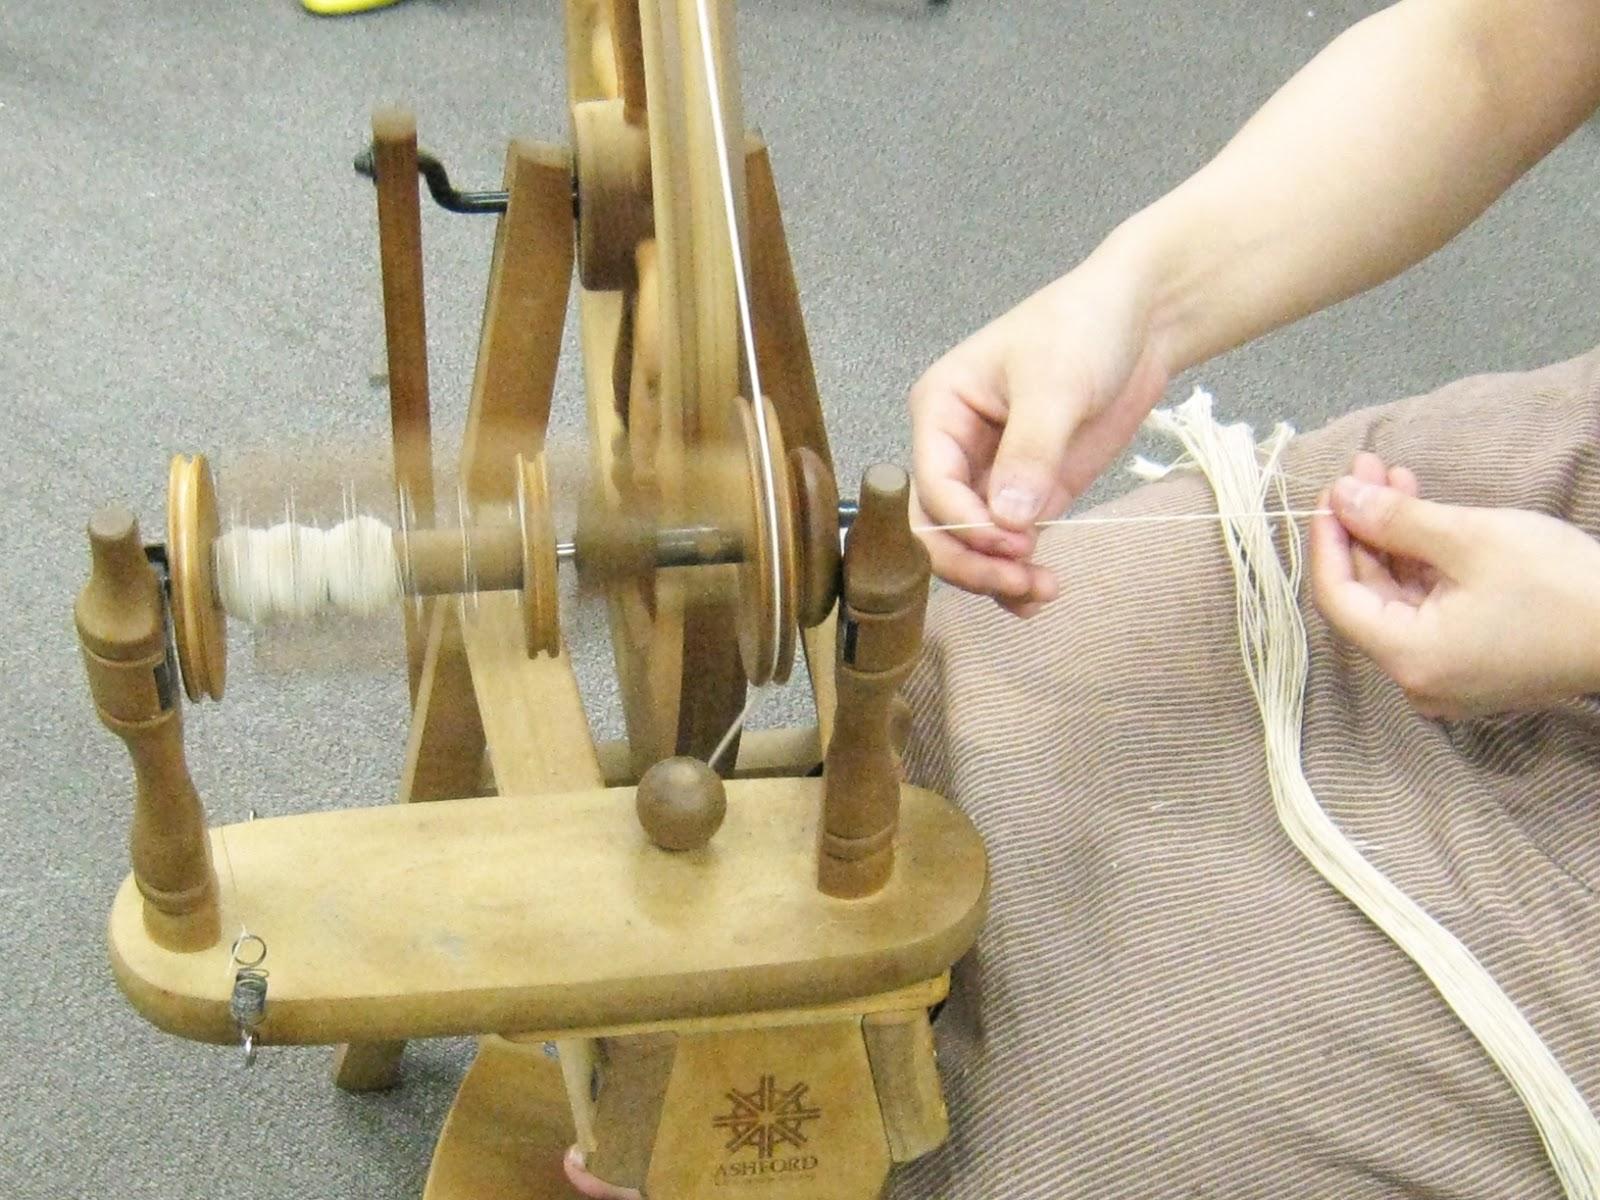 Kawashima Textile School Blog Shifu 1 Paper Yarn Making